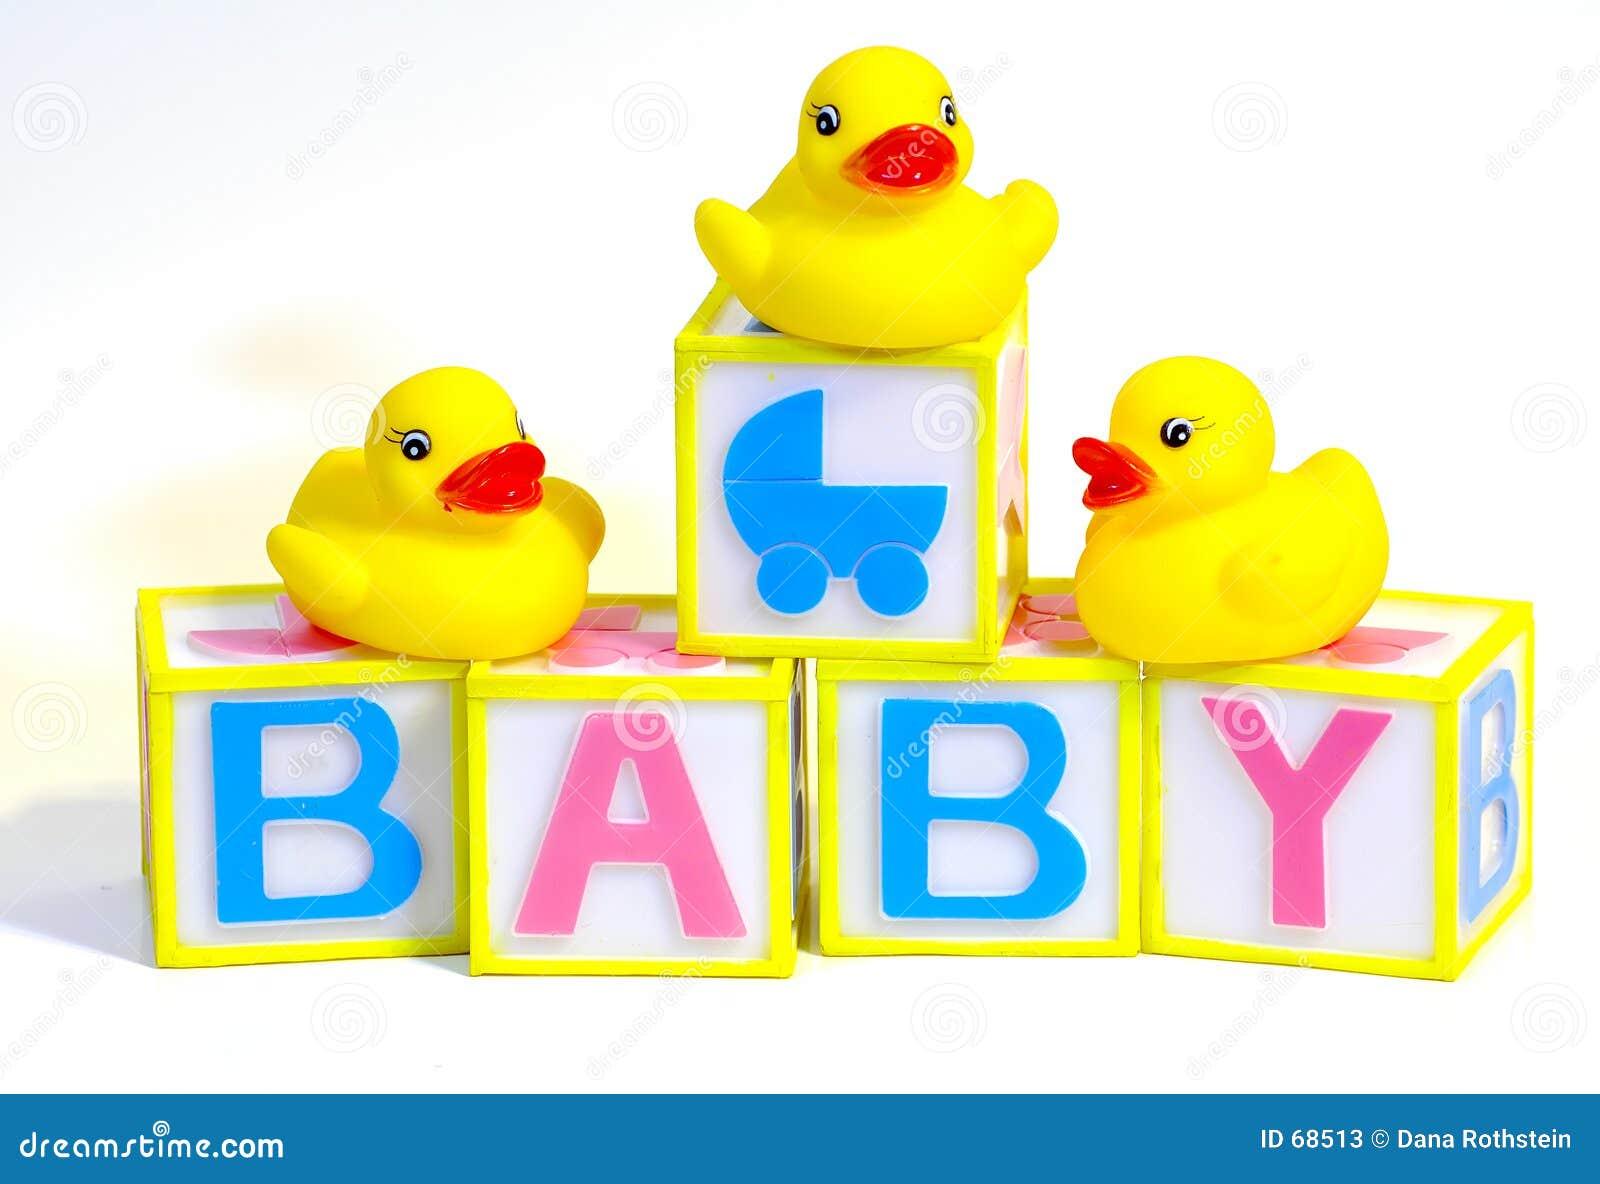 Blocks And Rubber Ducks Stock Photos - Image: 68513